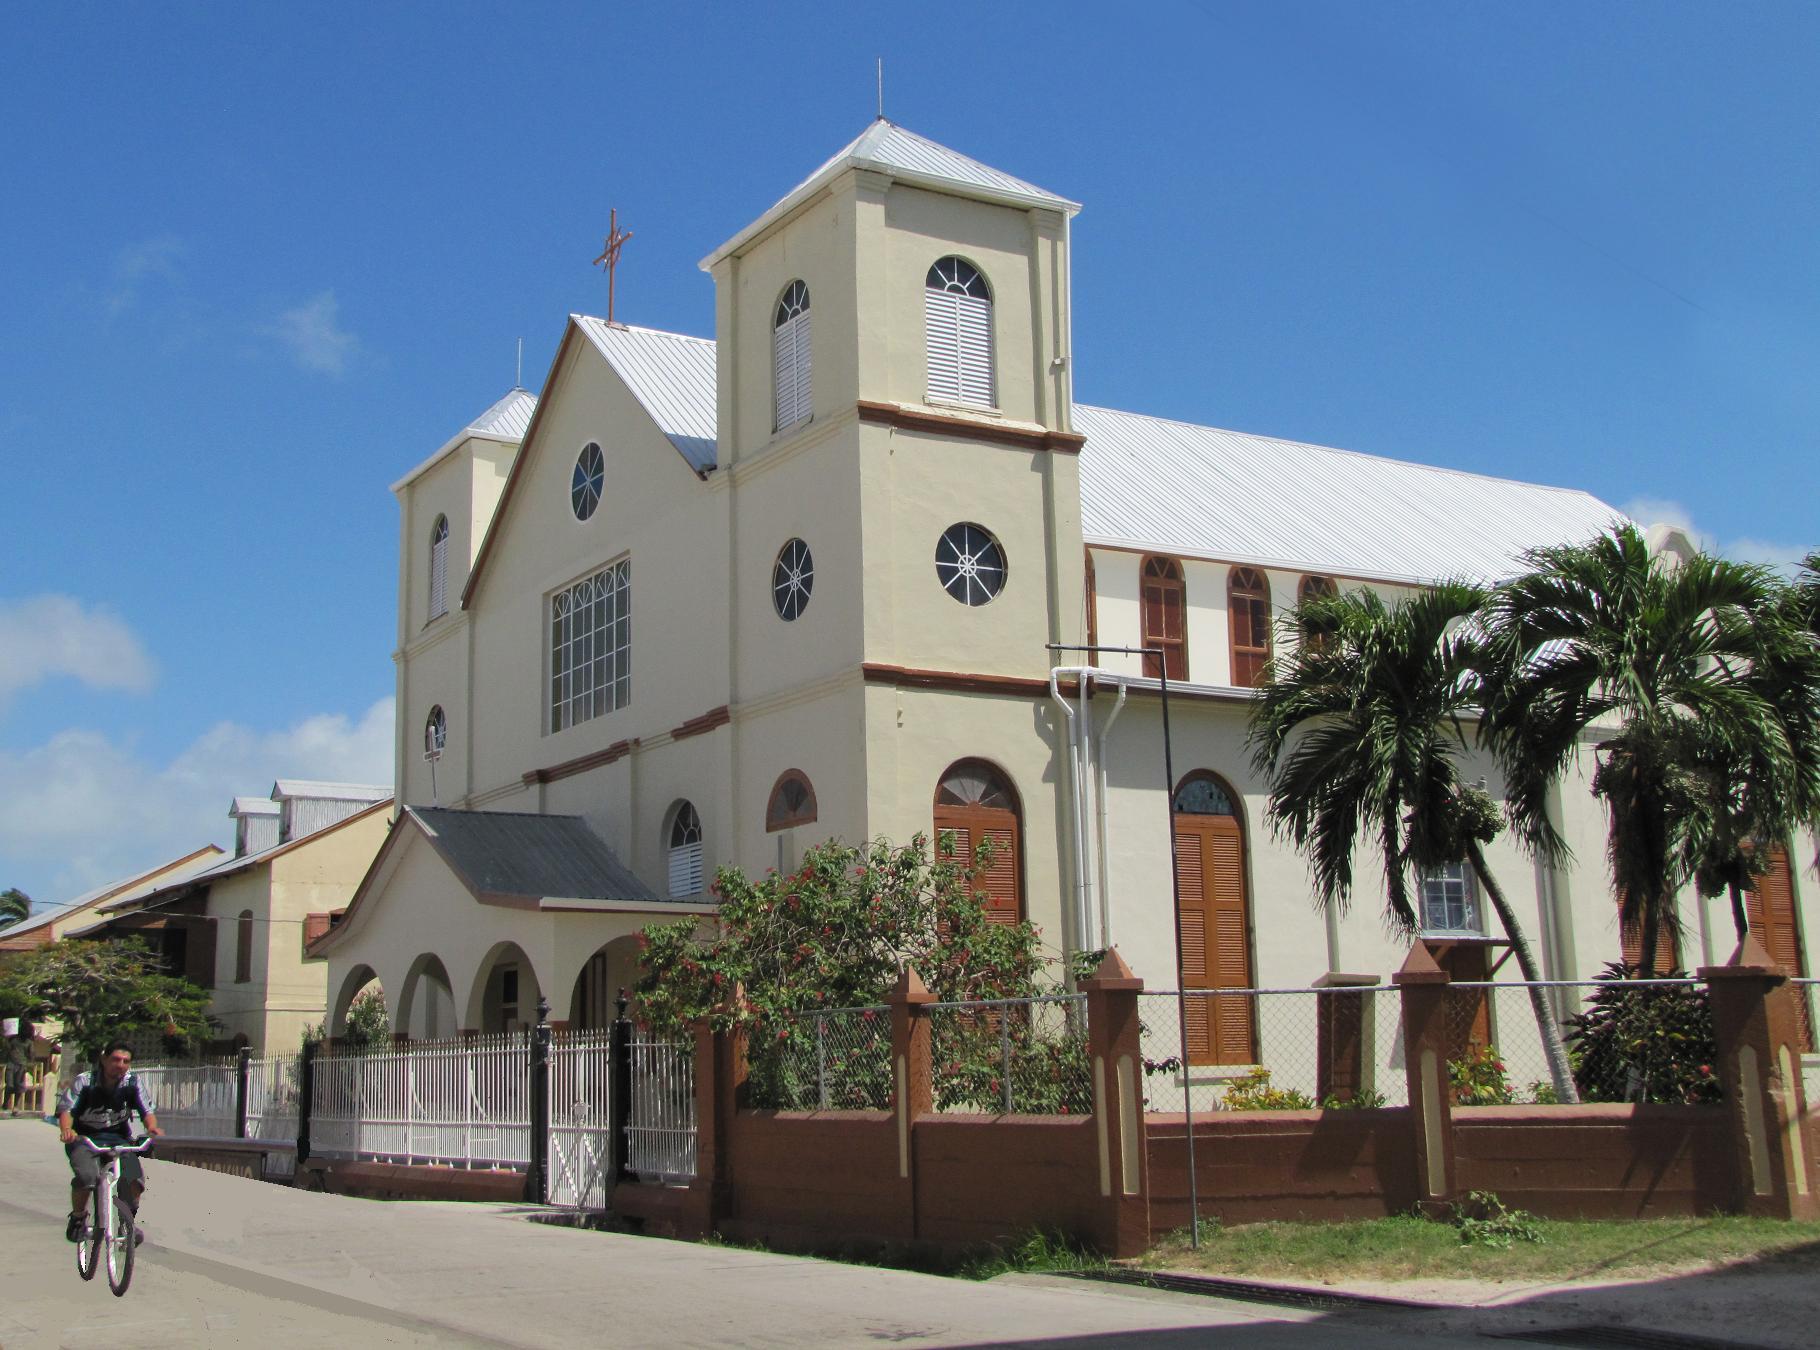 History of the Catholic Church in Belize - Wikipedia on hopkins university, johns hopkins map, hopkins organizational chart, jhu map, hopkins library hours, hopkins hospital map, er hopkins map, jhh map, hopkins state map,